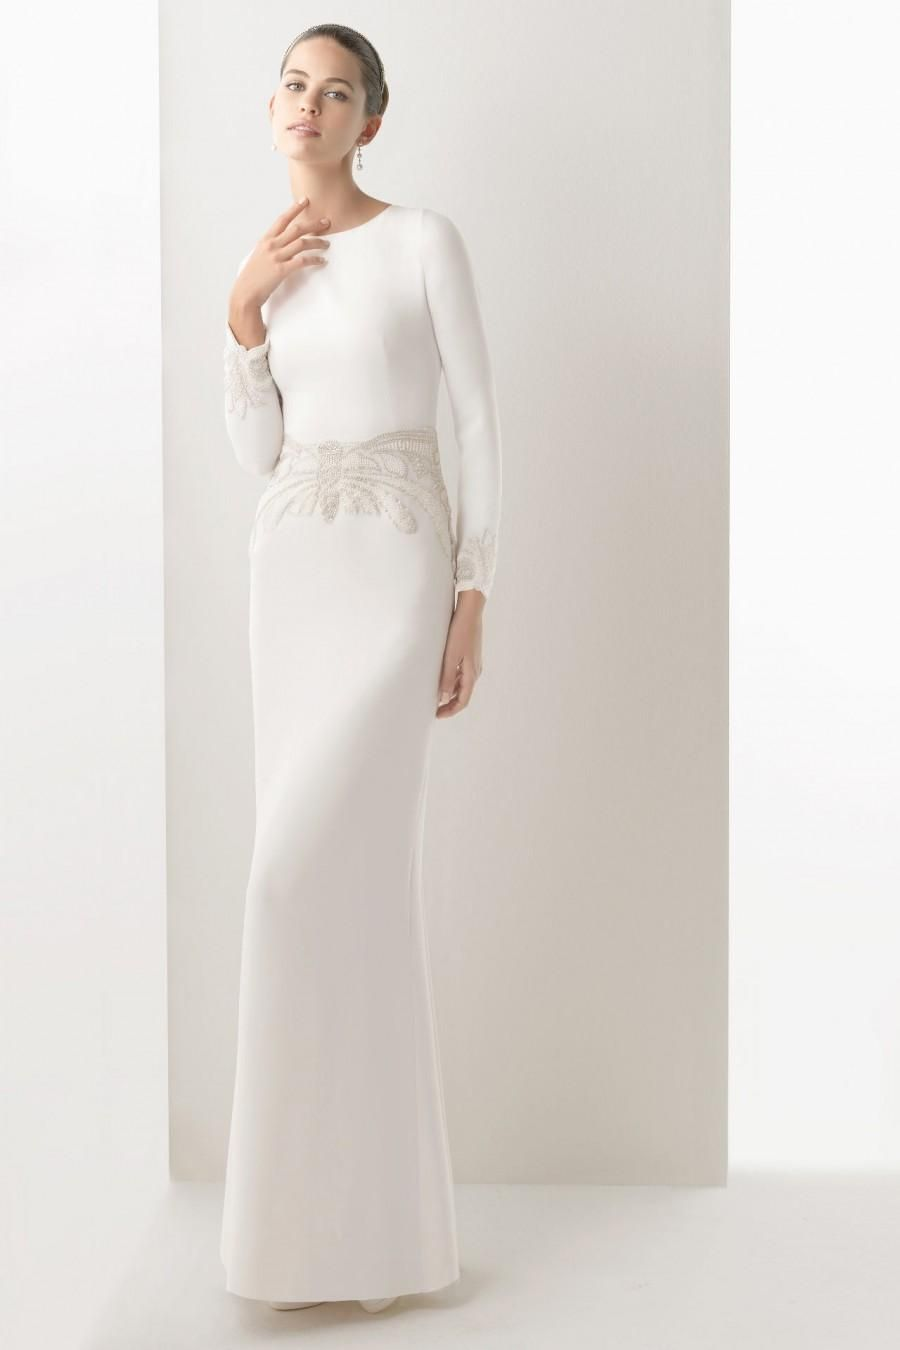 wedding dress long sleeve Sheath Scoop Beading Church Wedding Dress With Long Sleeve